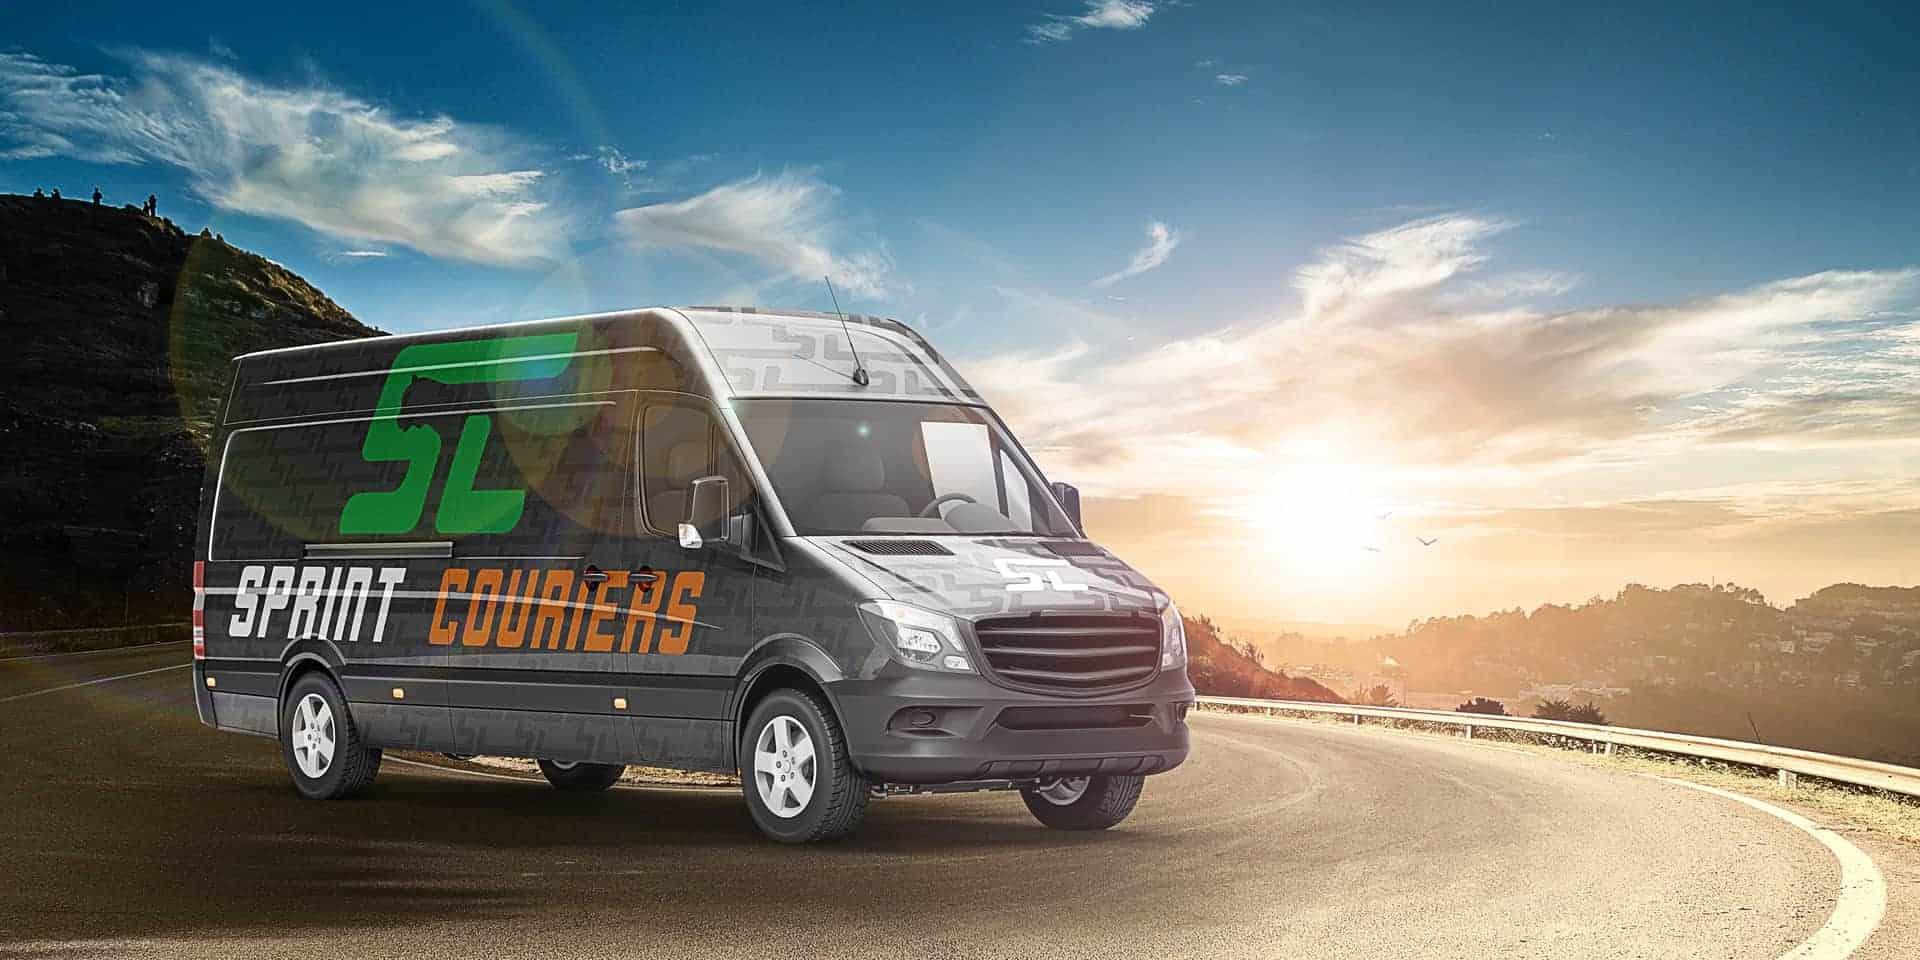 Sprint Couriers Rebranding